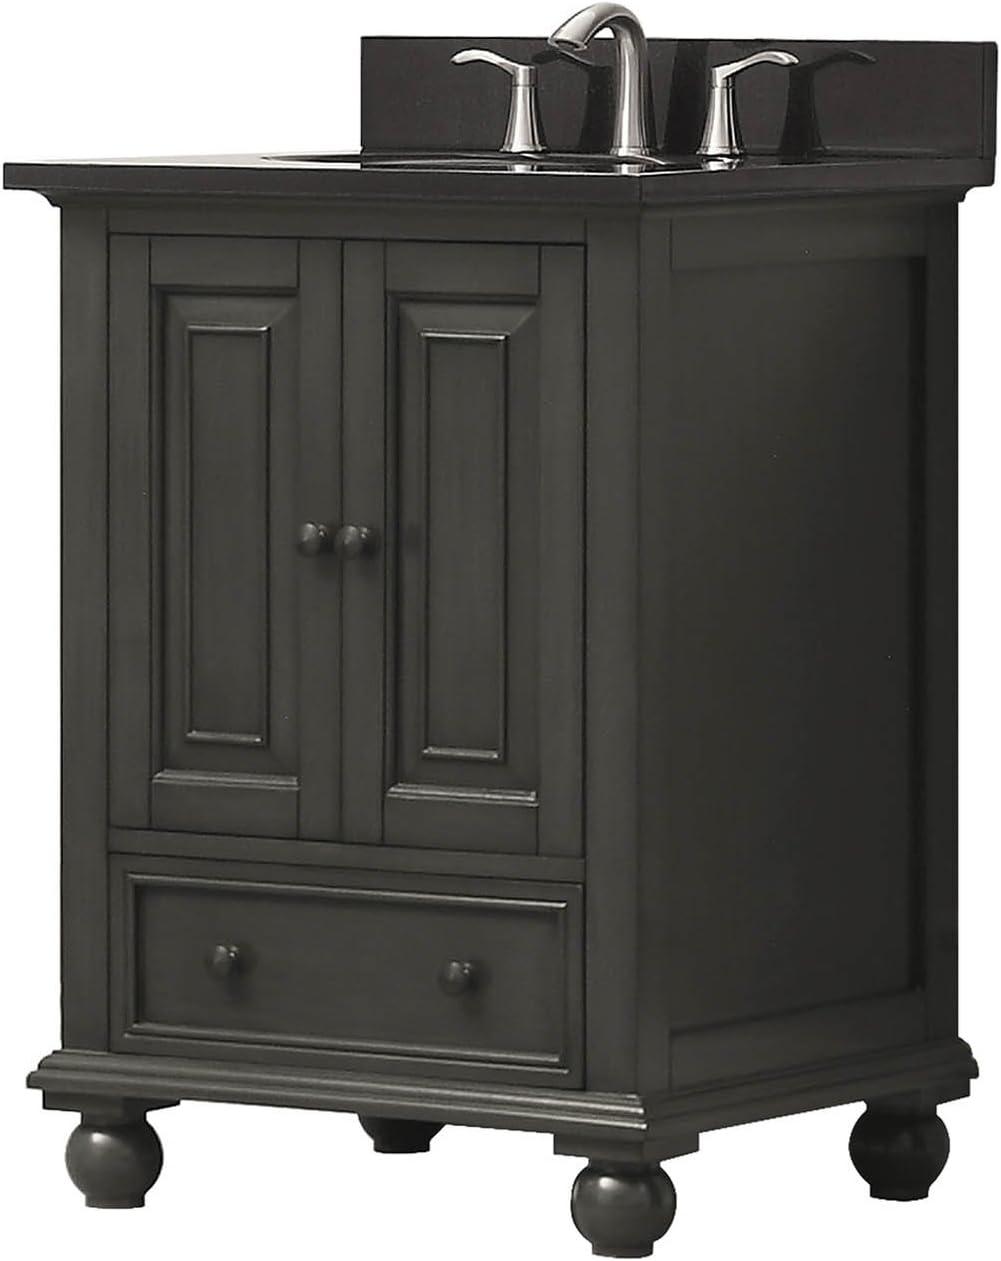 Avanity Thompson 25 in Vanity Combo in Charcoal Glaze finish with Black Granite Top